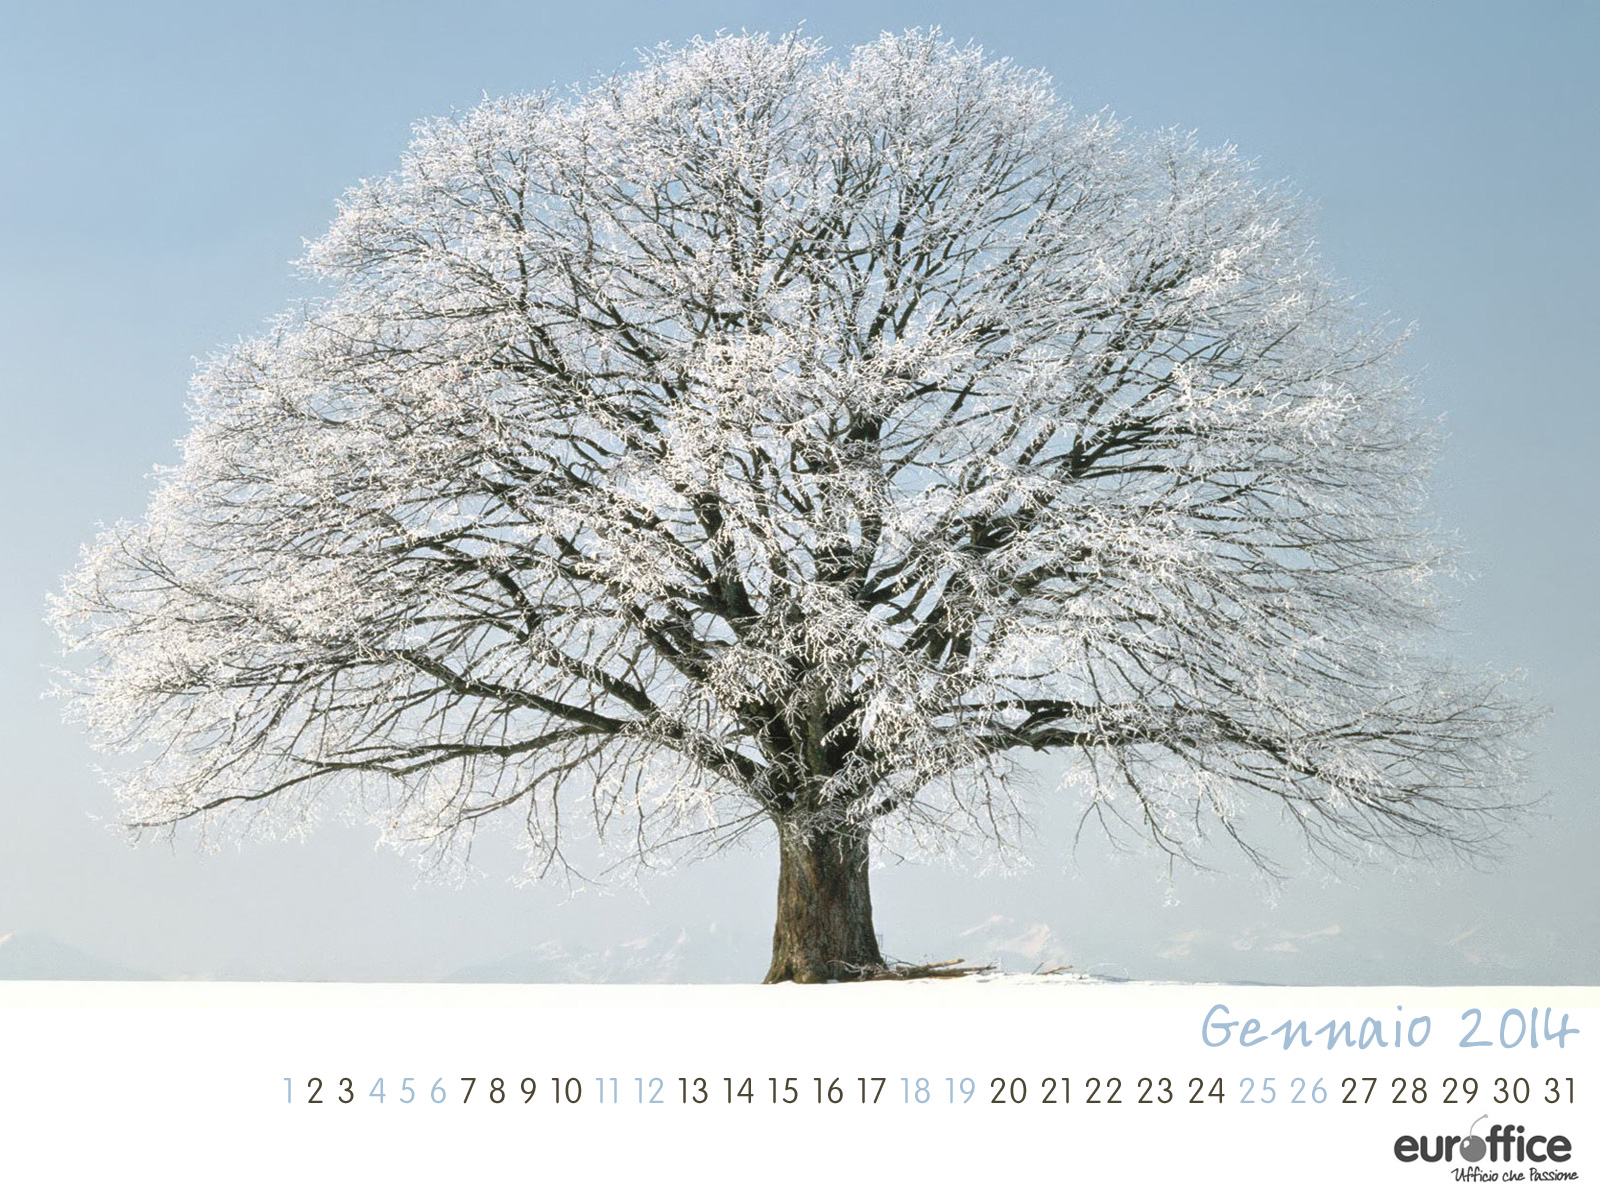 Wallpaper gennaio 2014 - Albero innevato